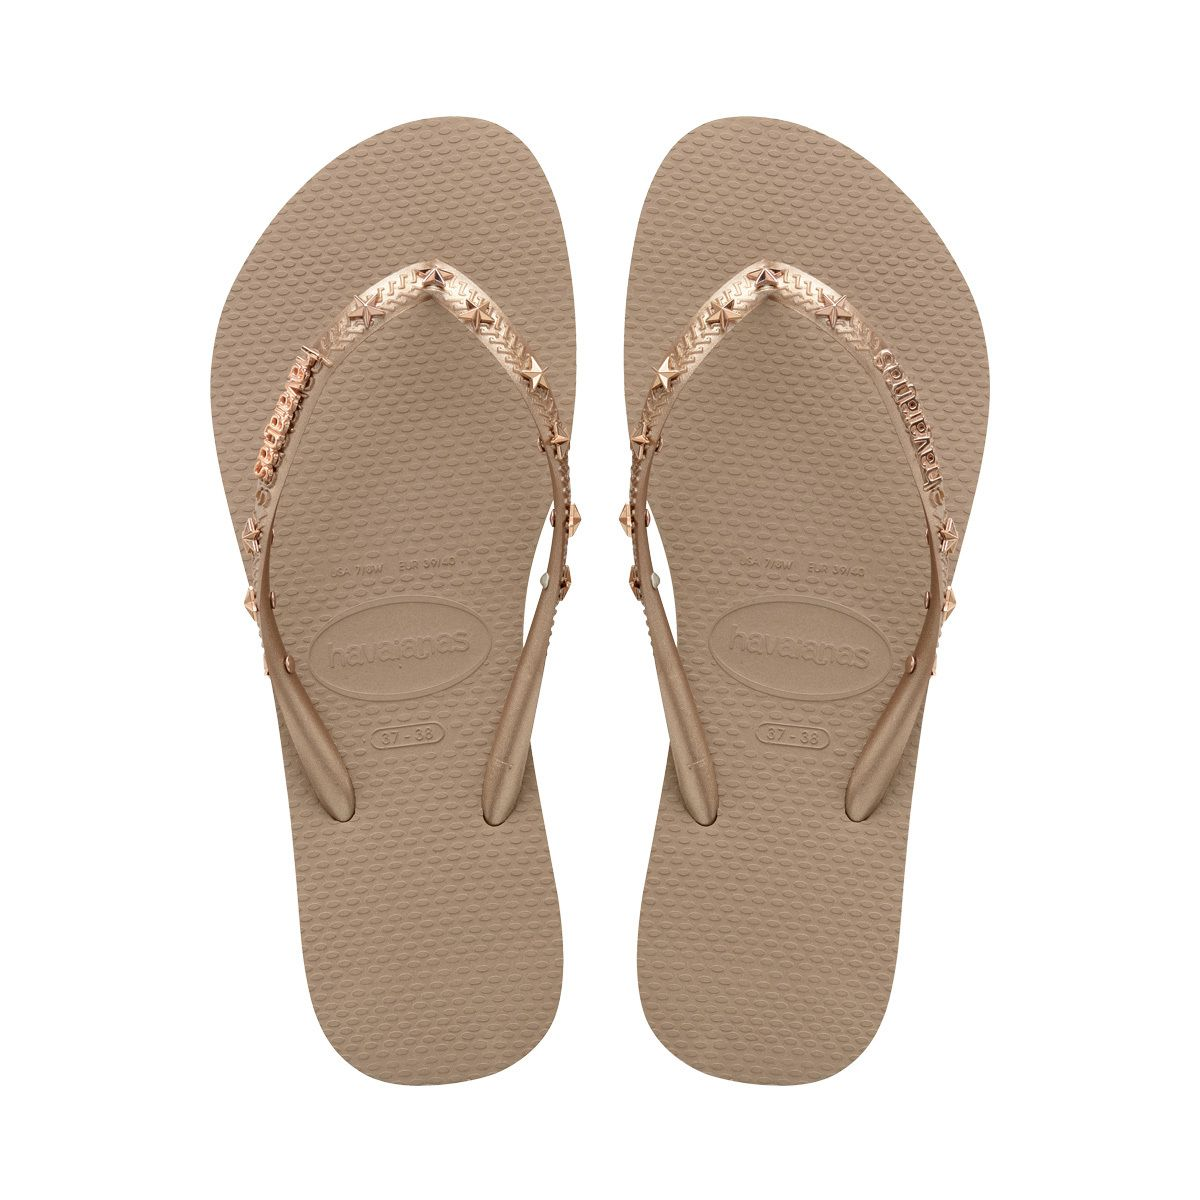 Womens sandals walmart - The Slim Hardware Rose Gold Women S Flip Flops Sandals Havaianas